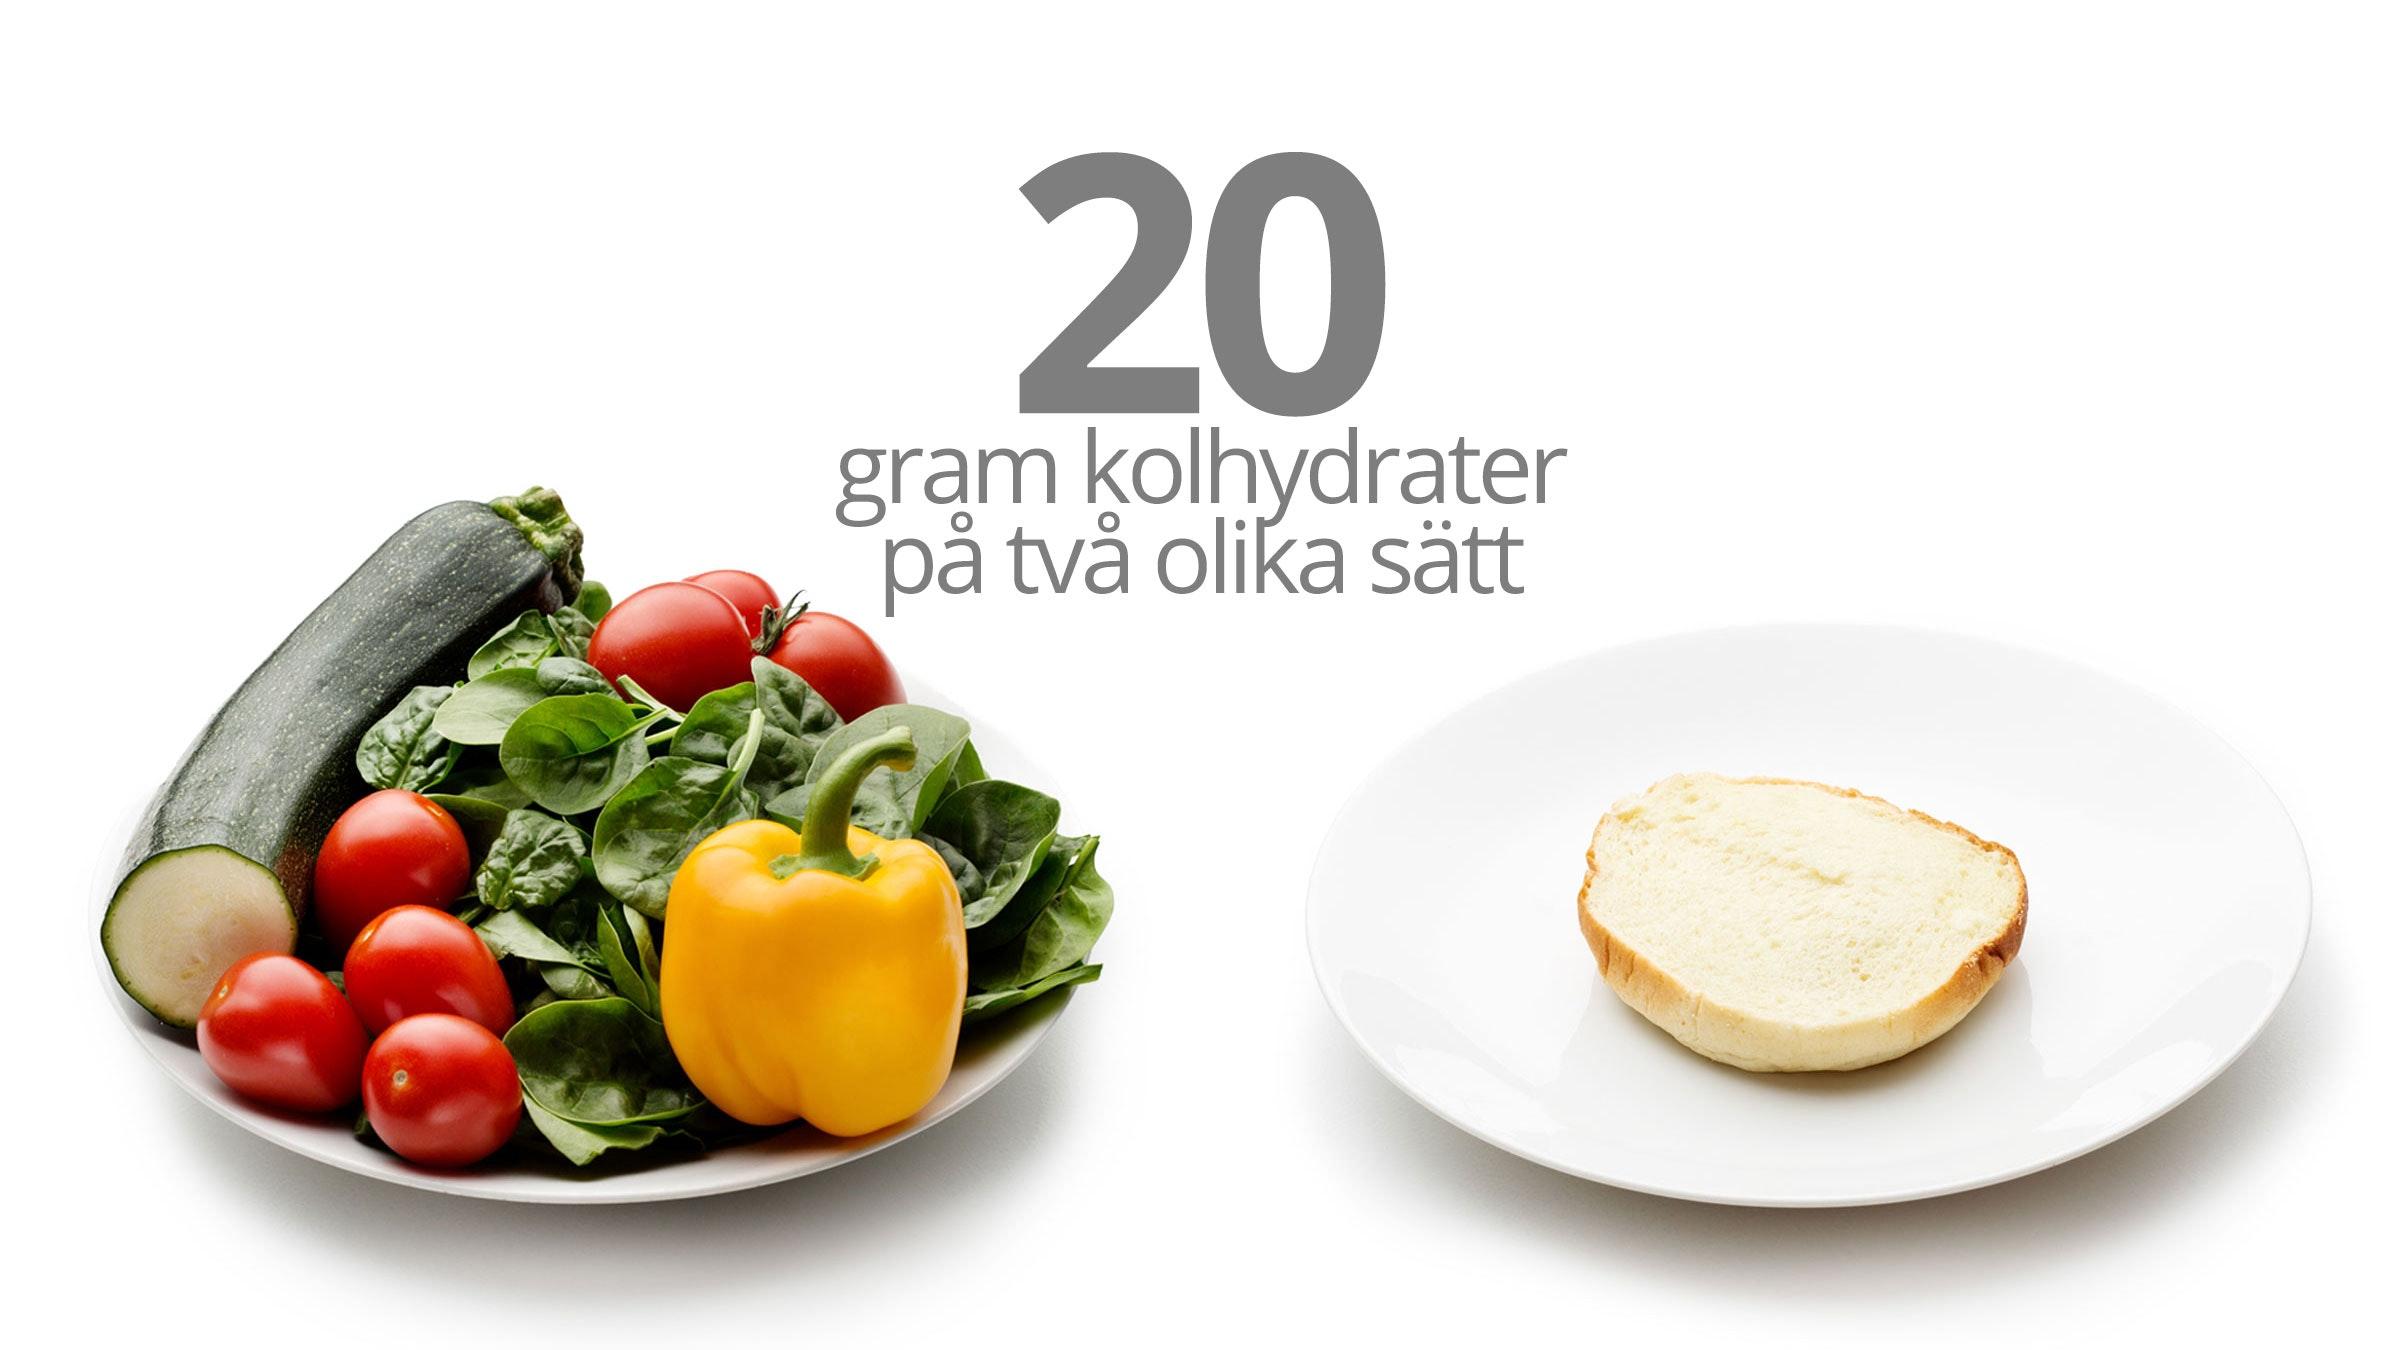 lchf kalorier per dag